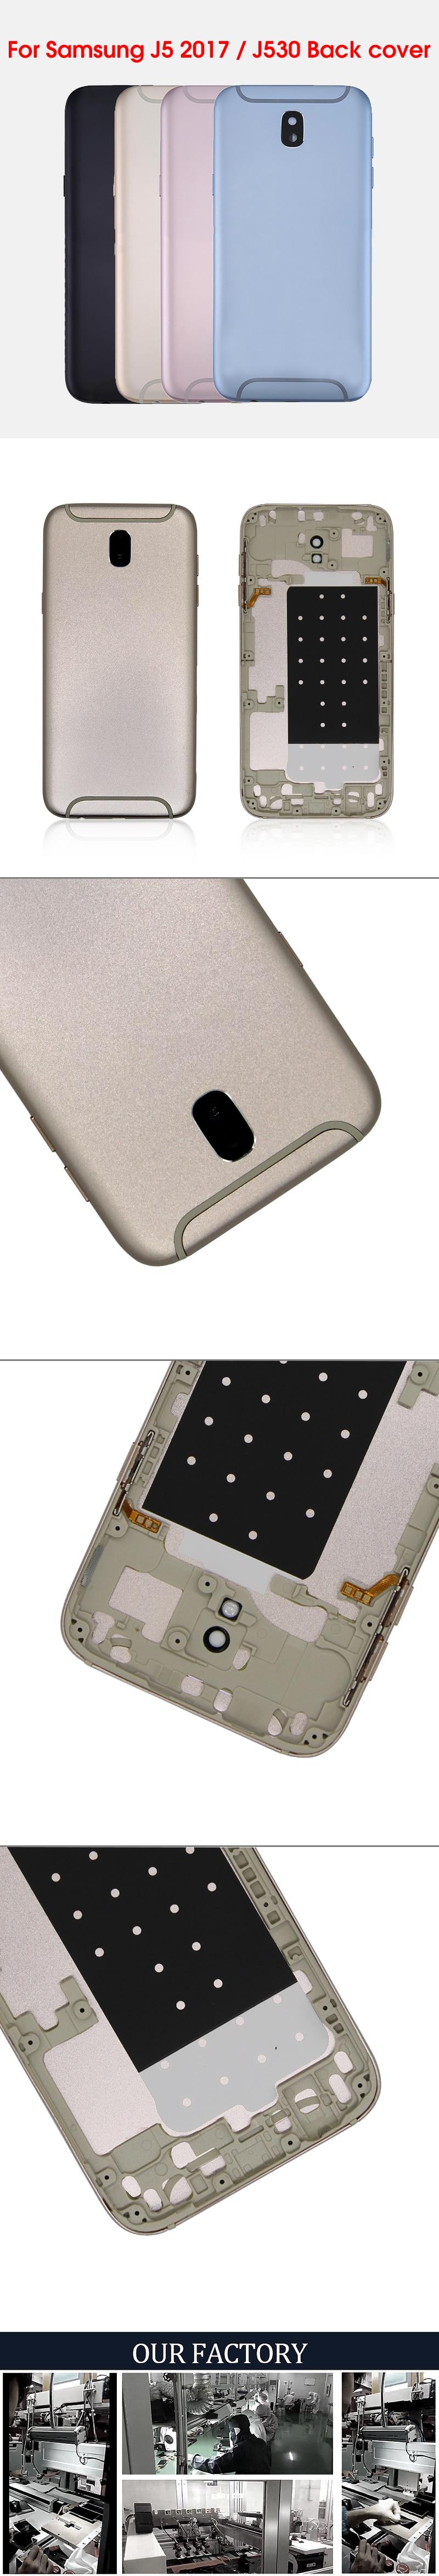 Samsung-j530-详情